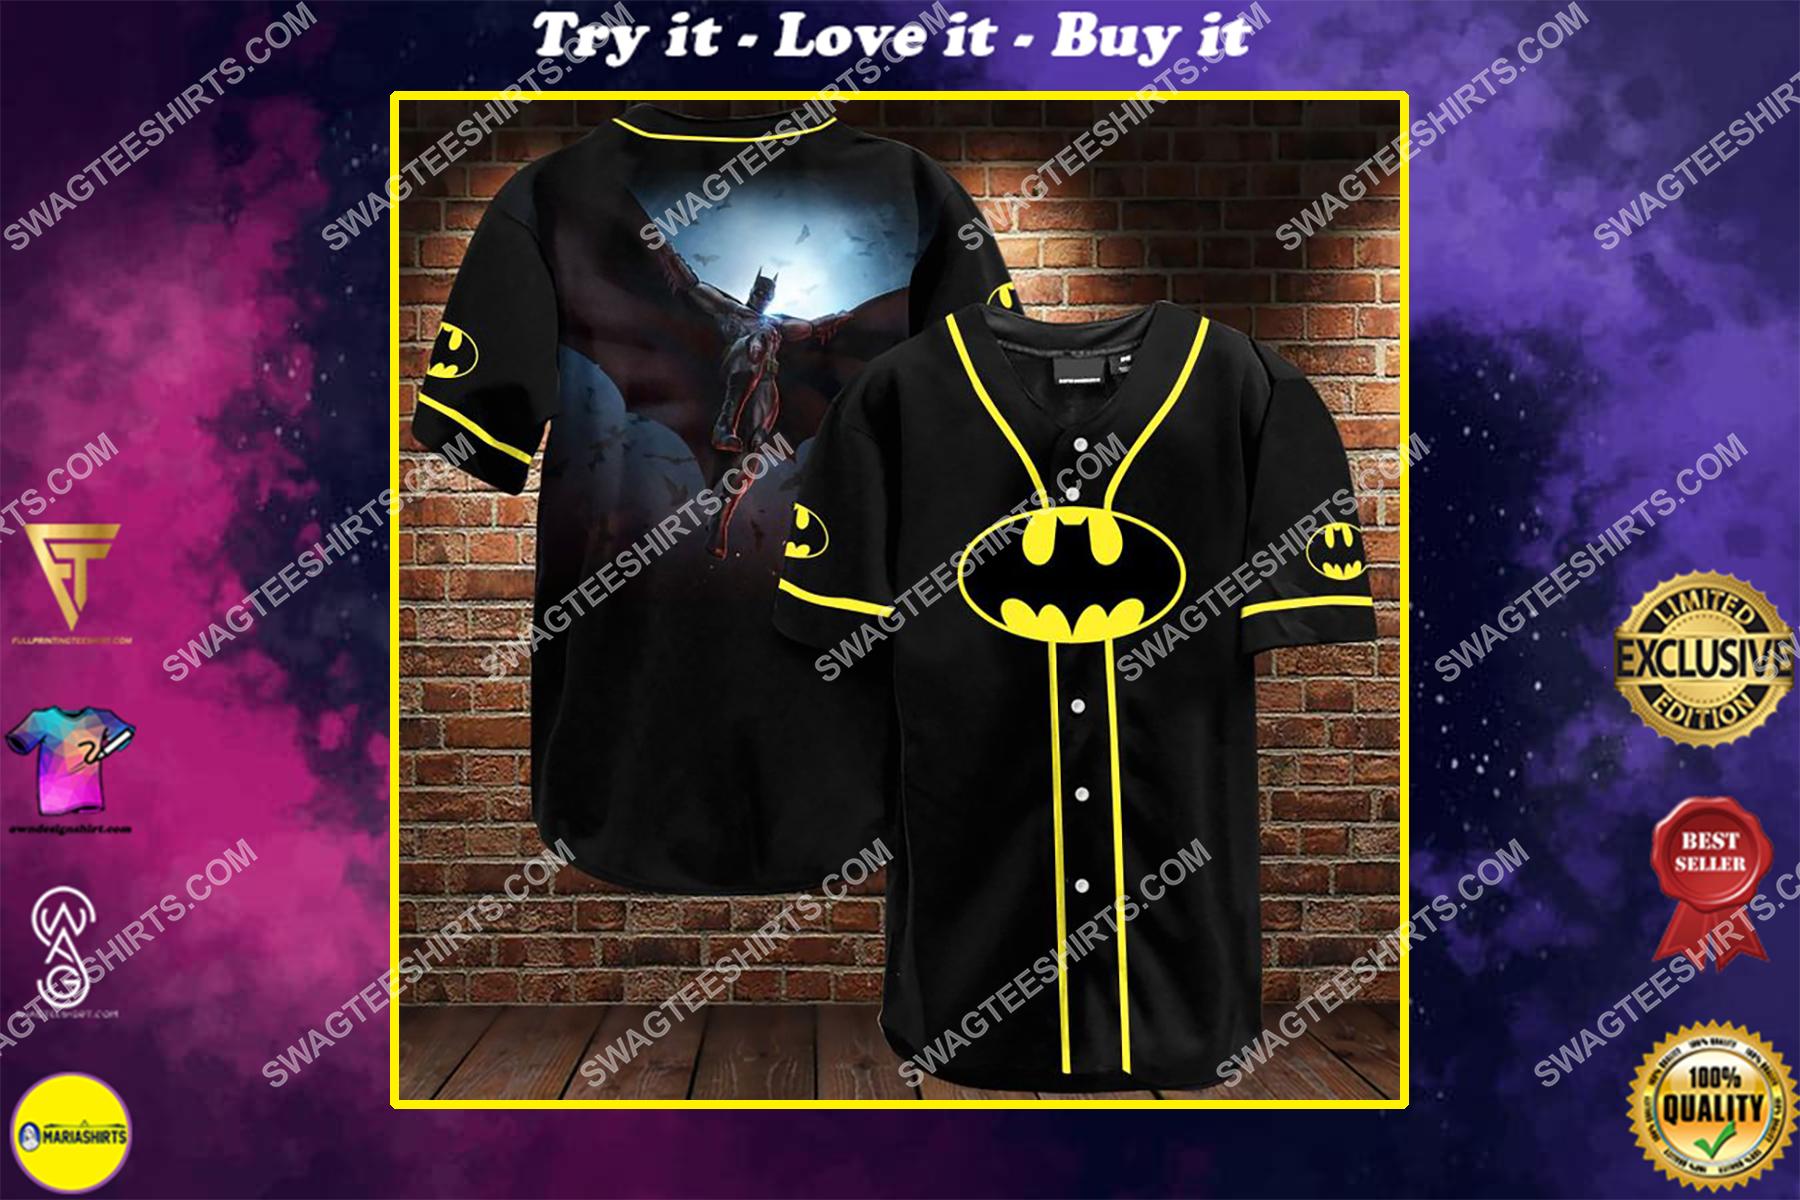 the batman all over printed baseball shirt